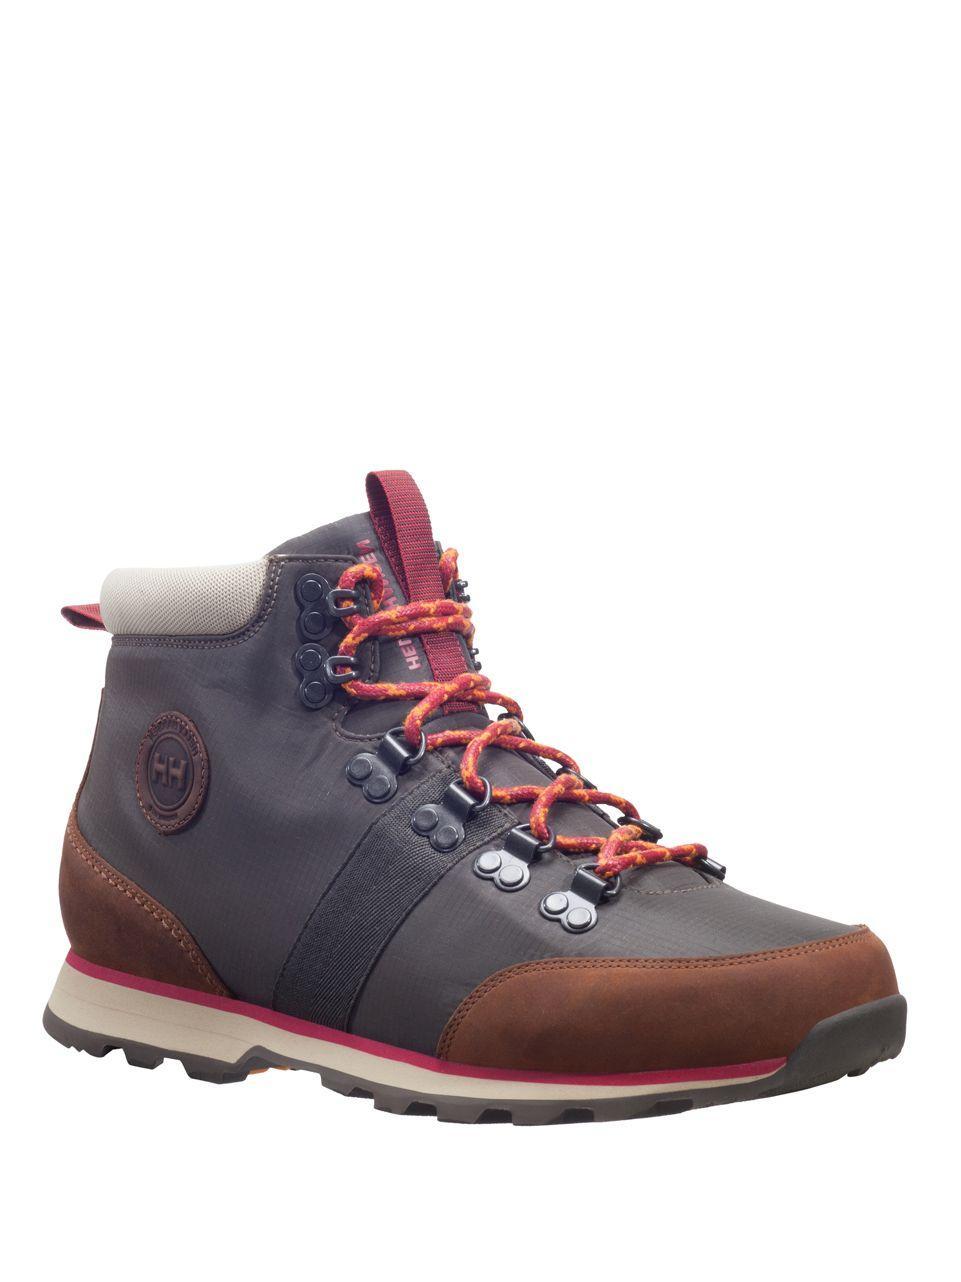 Lyst Helly Hansen Skage Sport Hiking Boots For Men